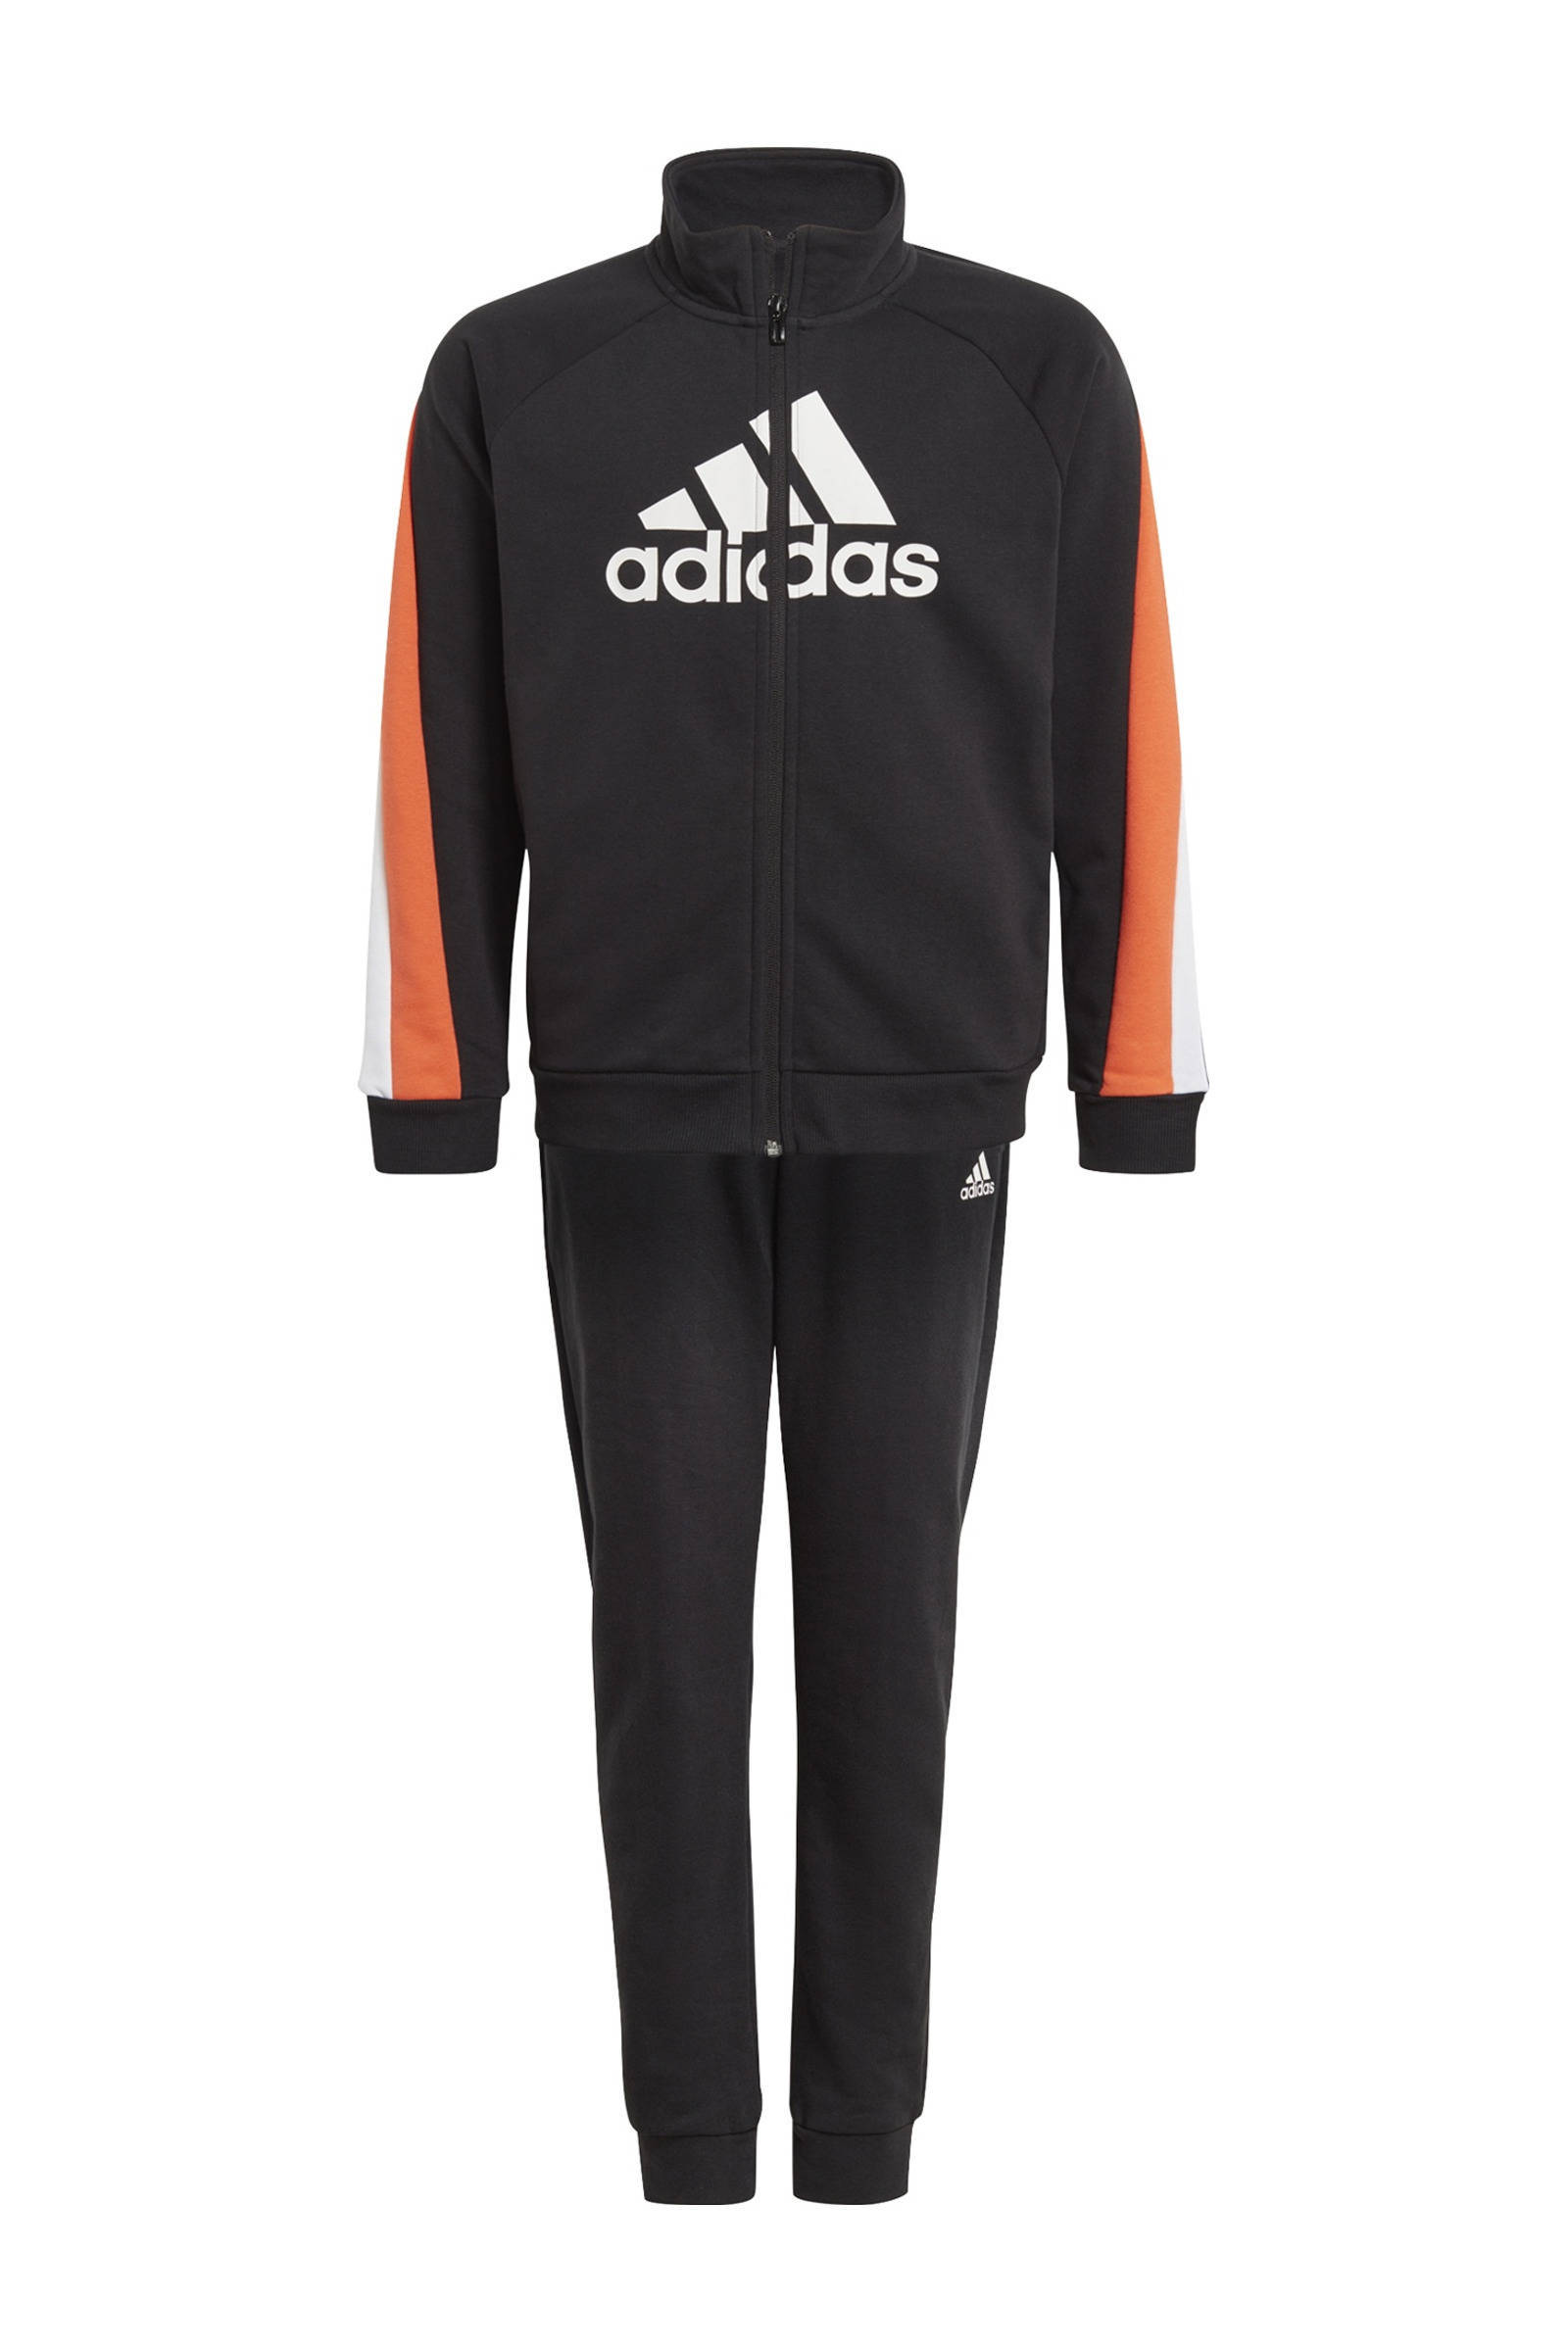 Adidas Colorblock Big Badge of Sport Trainingspak Junior online kopen